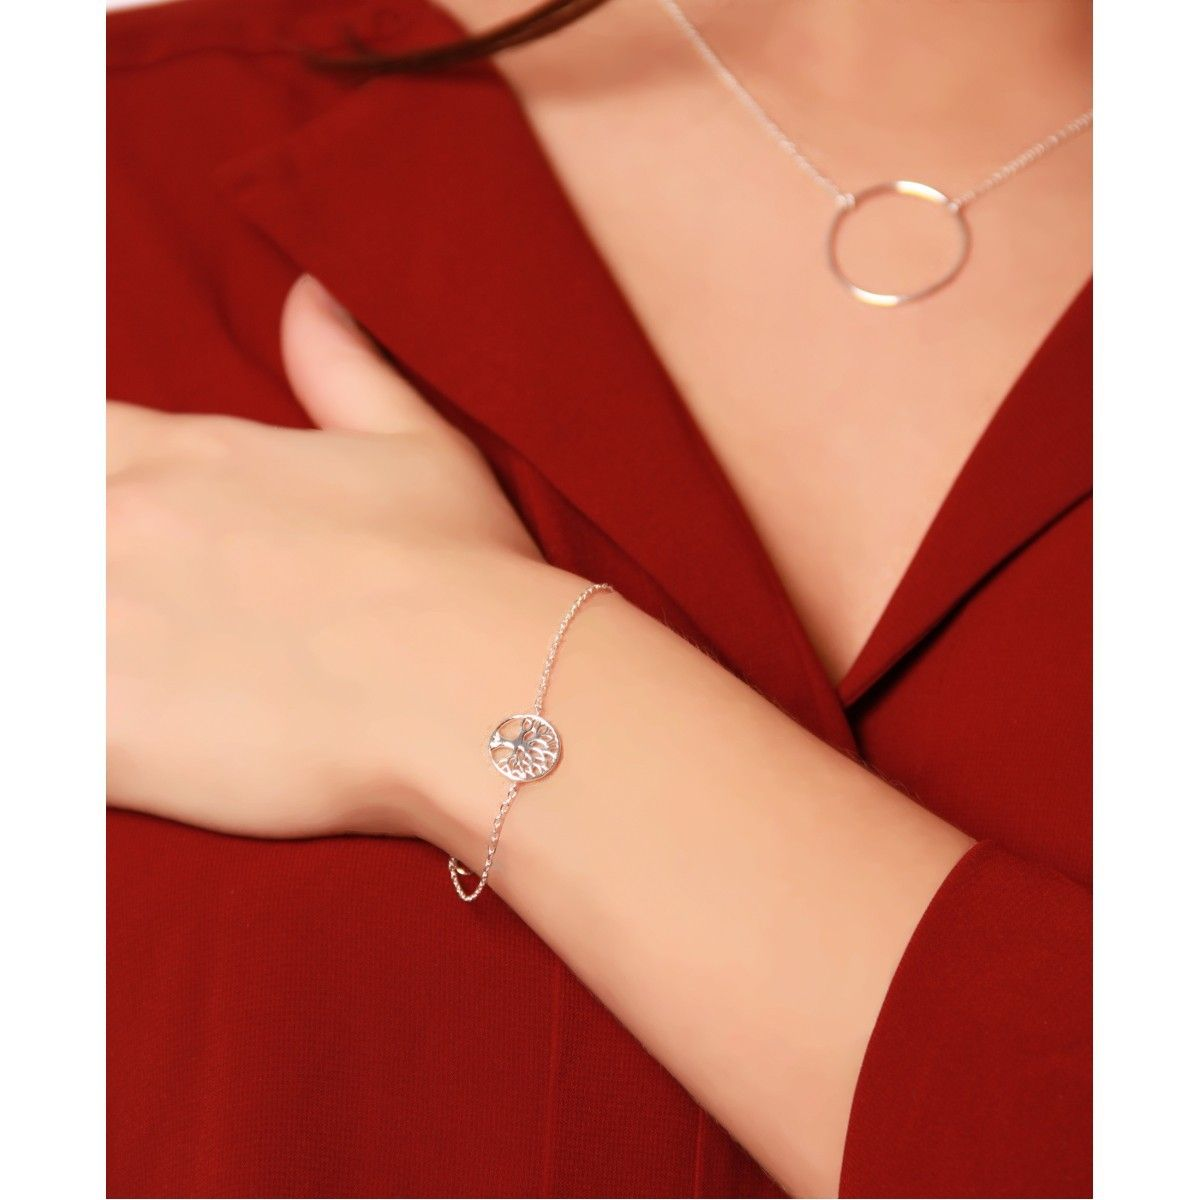 La vie en or bracelet en argent